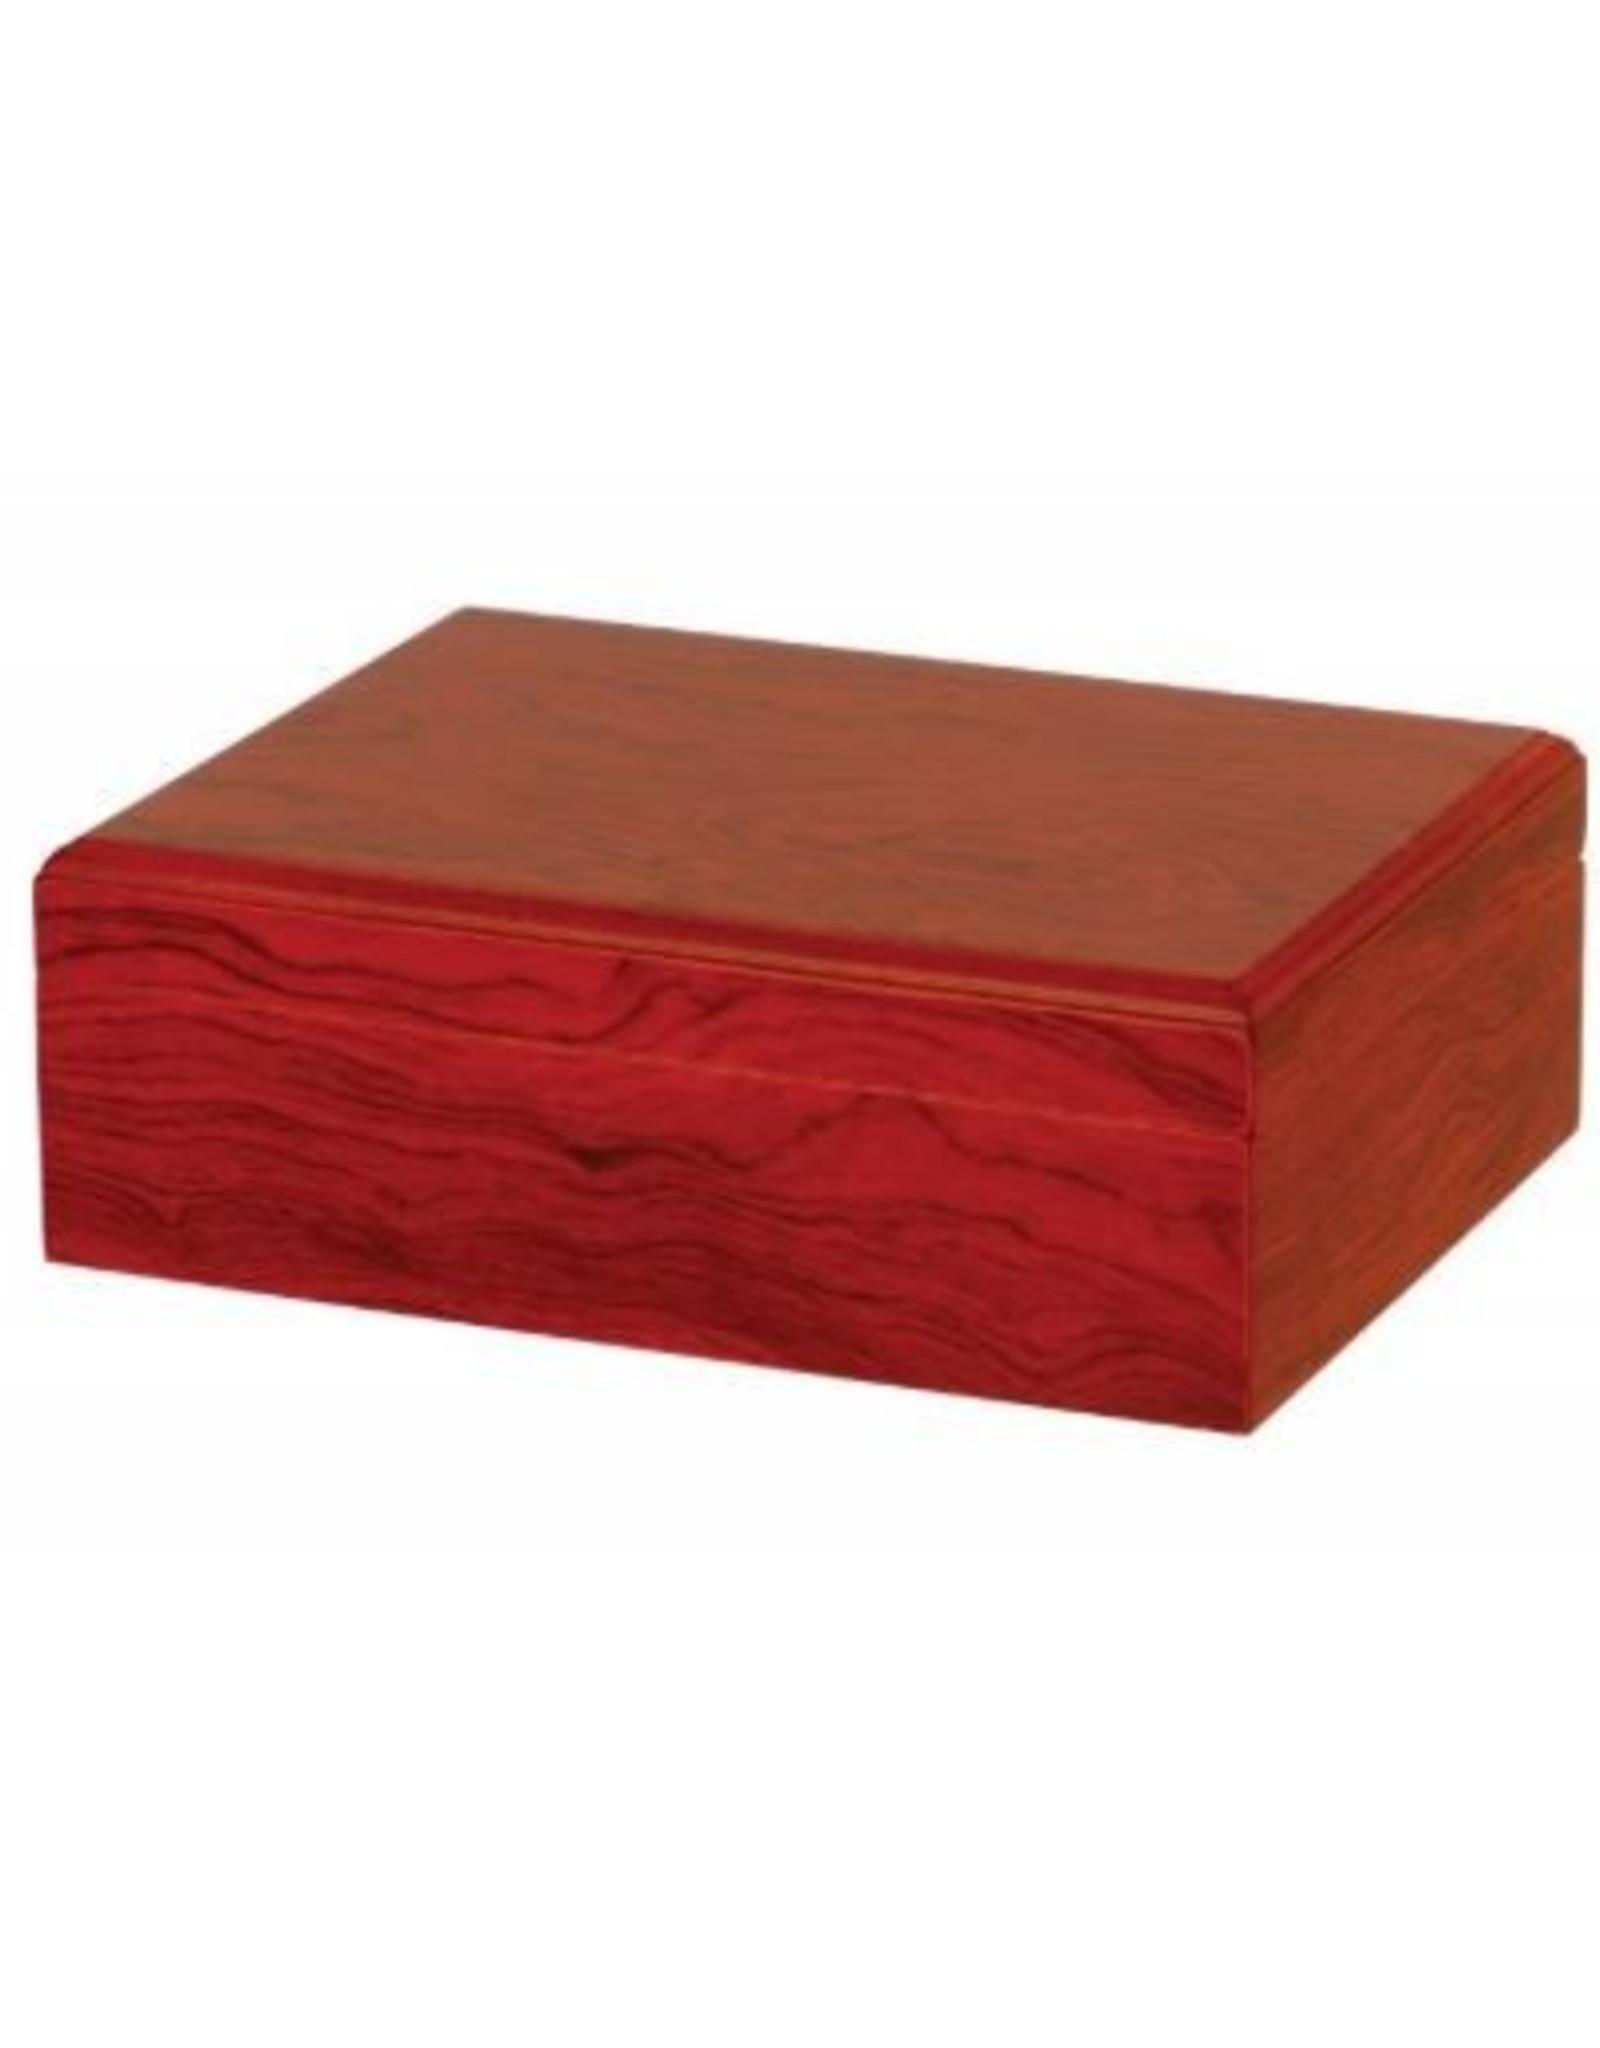 Zorr Wooden Humidor Brown